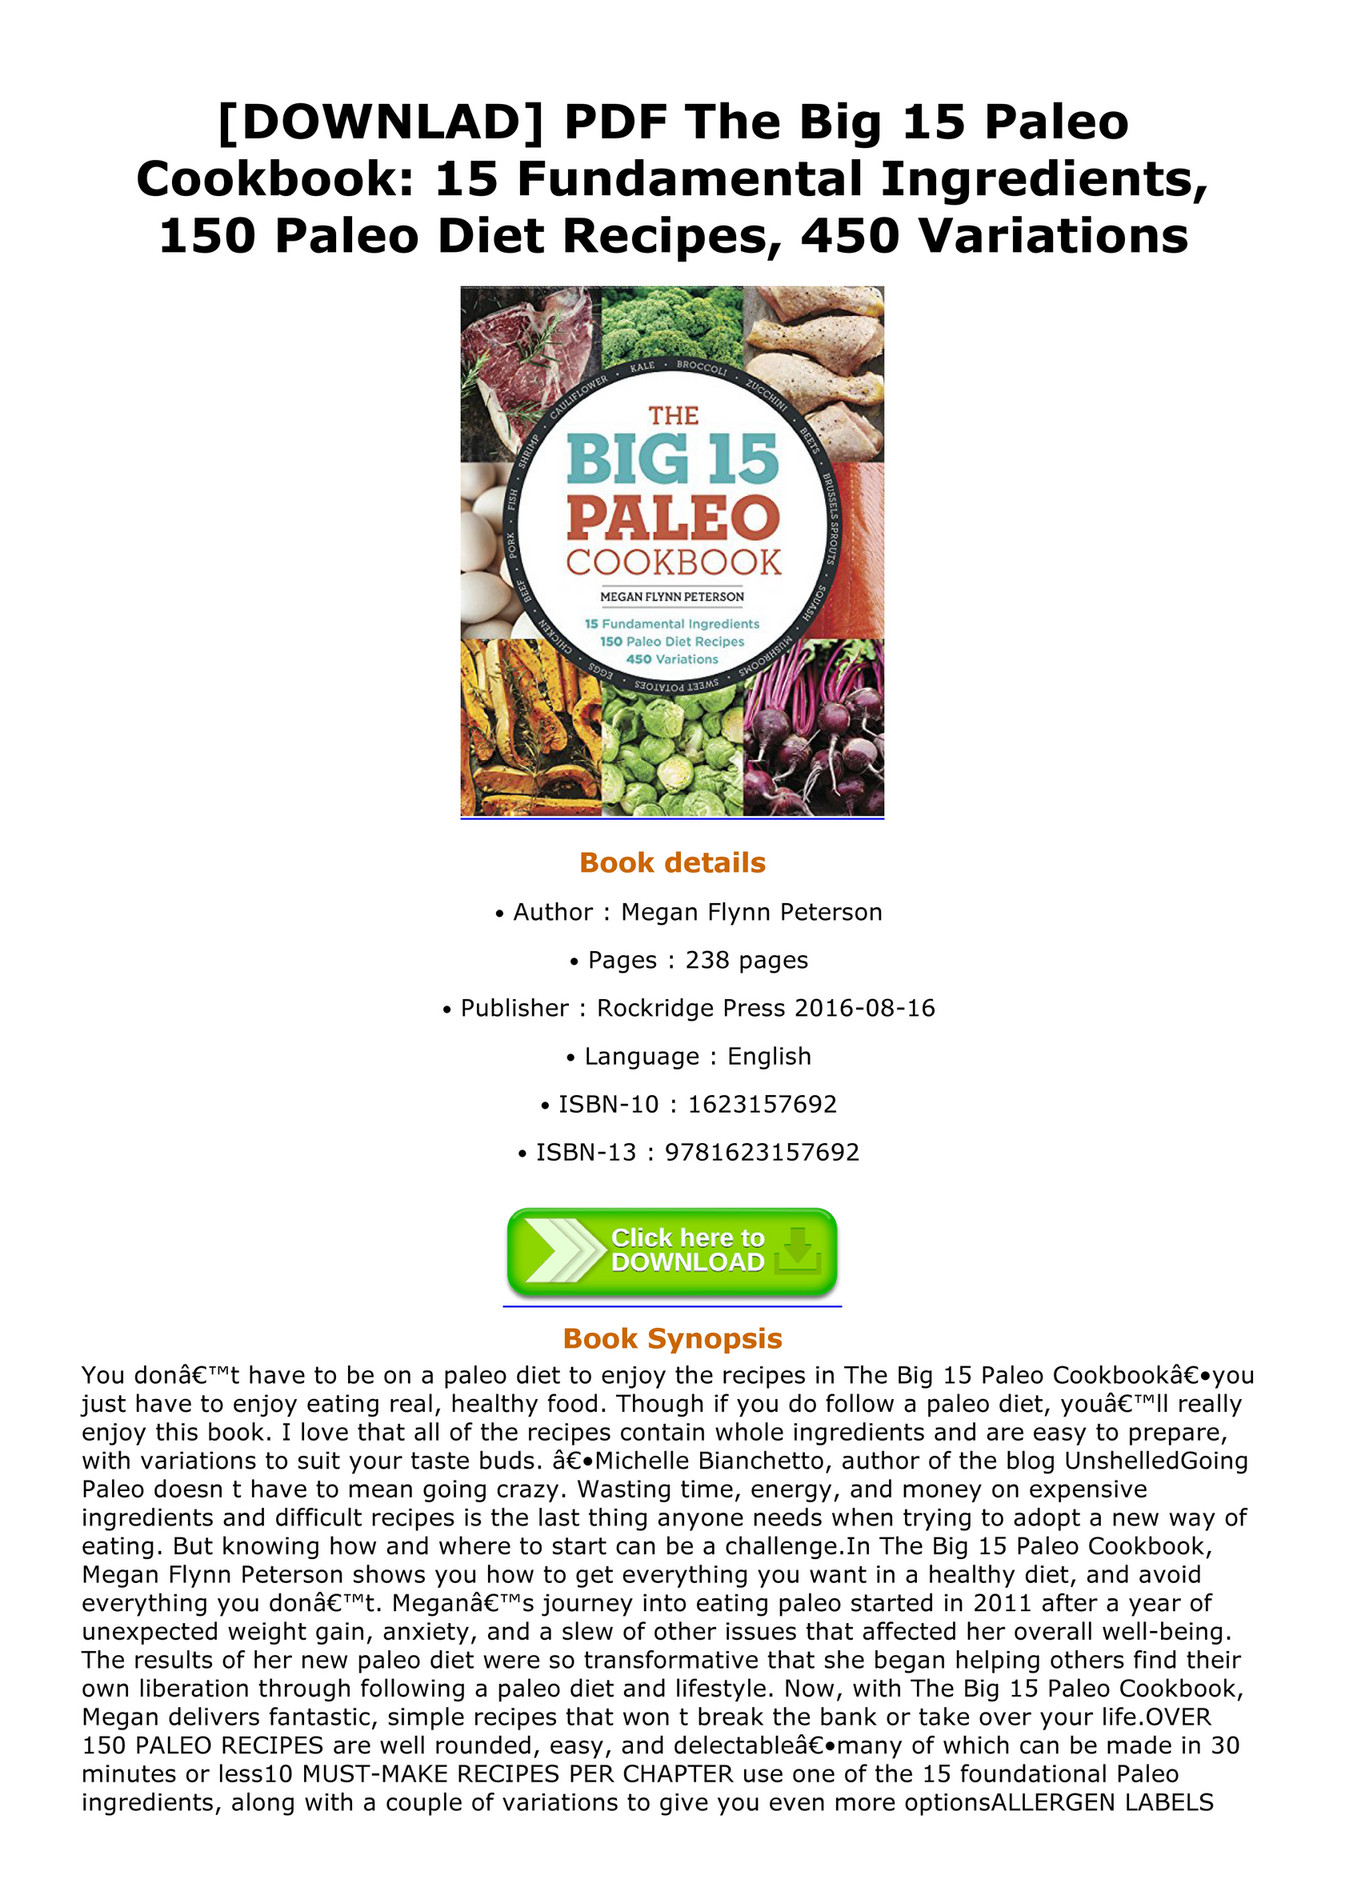 Paleo Diet For Ms